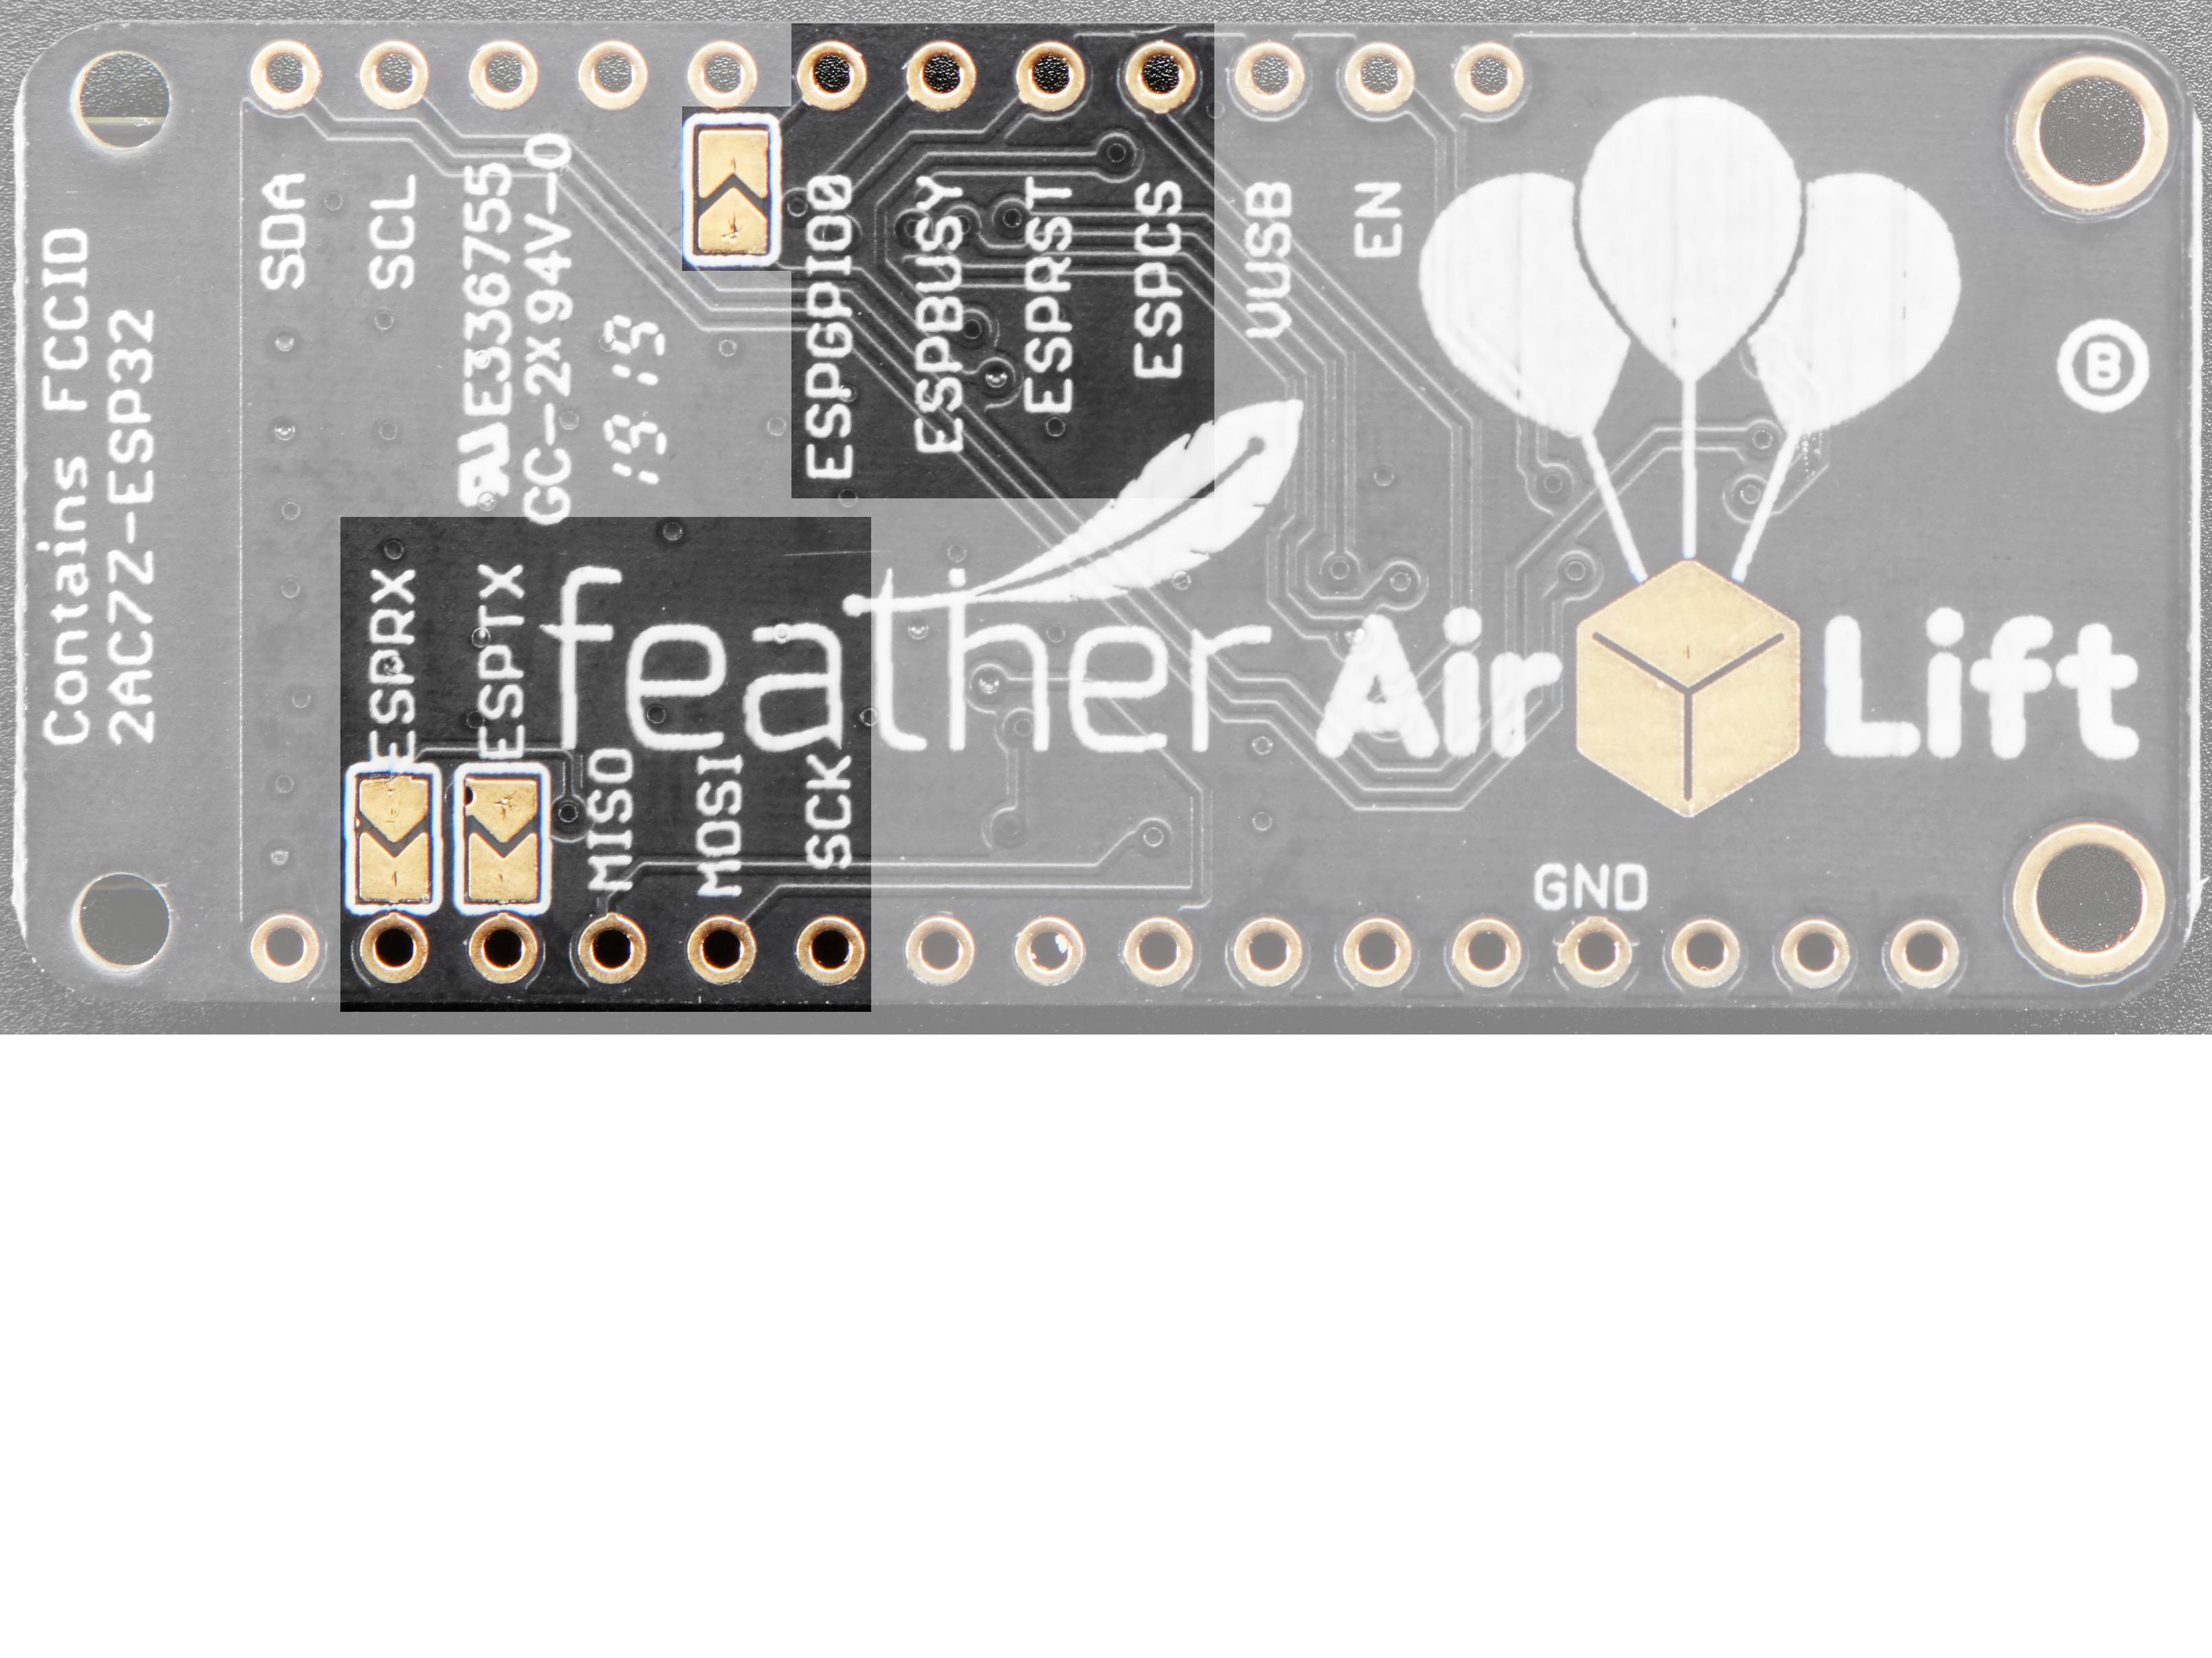 adafruit_products_4264_back_spi_control_pins.jpg